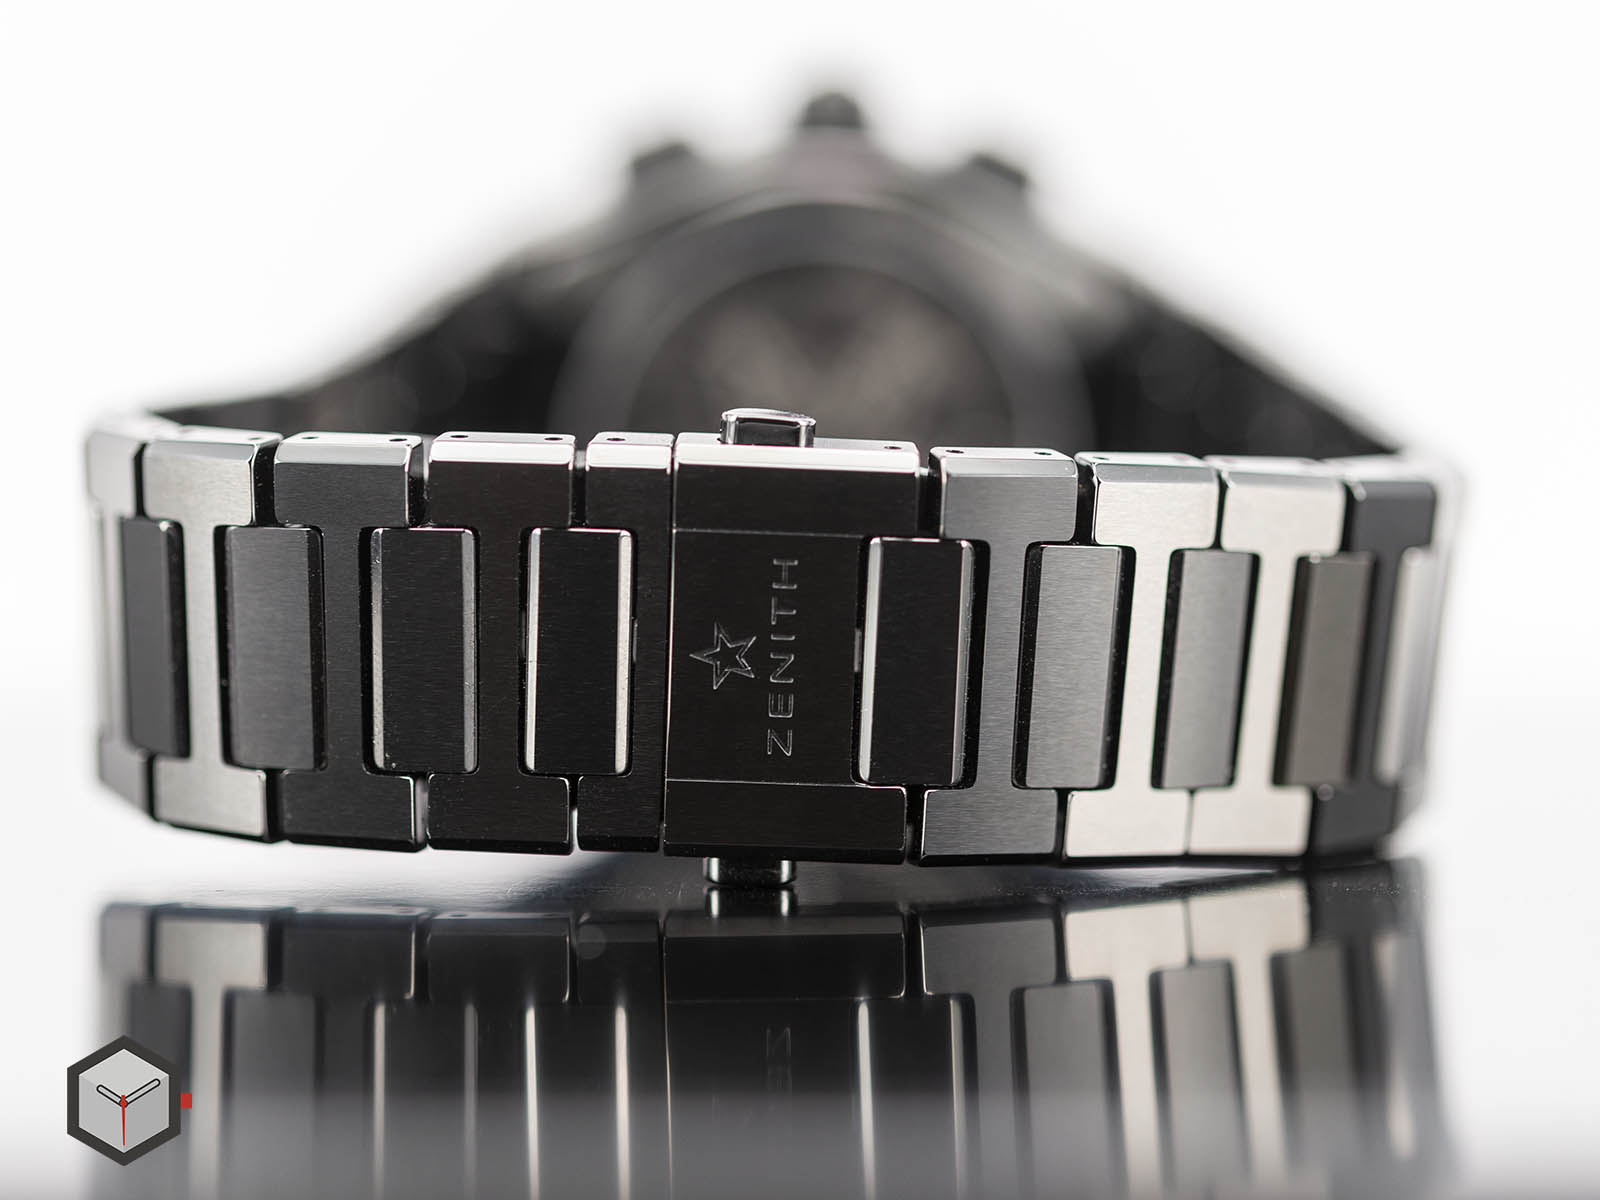 49-9000-9004-78-m9000-zenith-defy-el-primero-21-black-ceramic-10.jpg